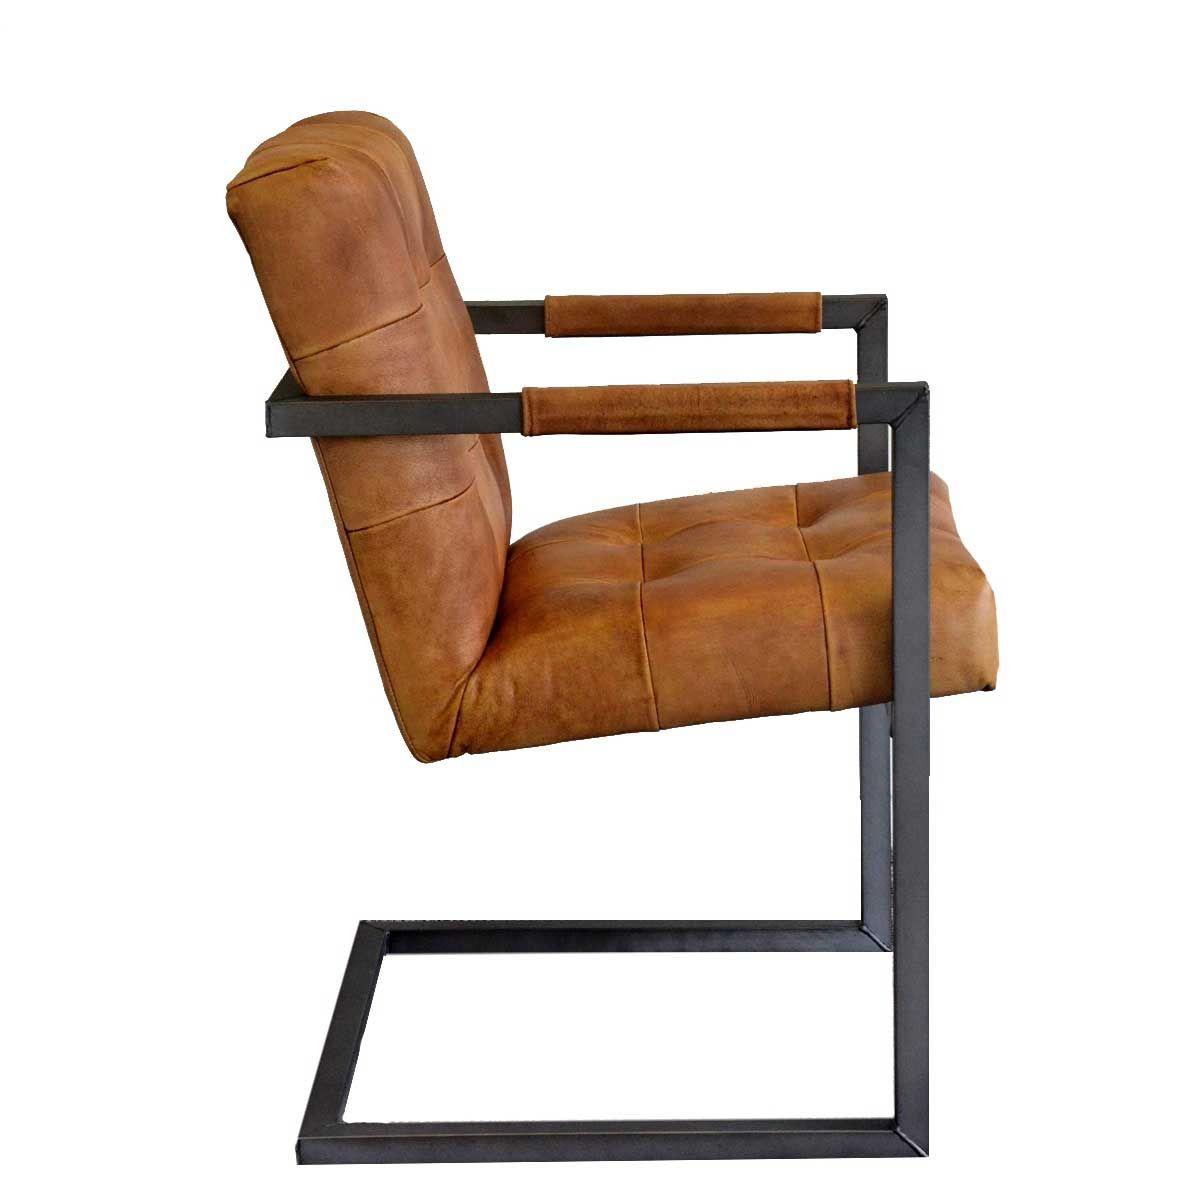 Esszimmer Stuhl Basie cognac Konferenzstuhl echt Leder